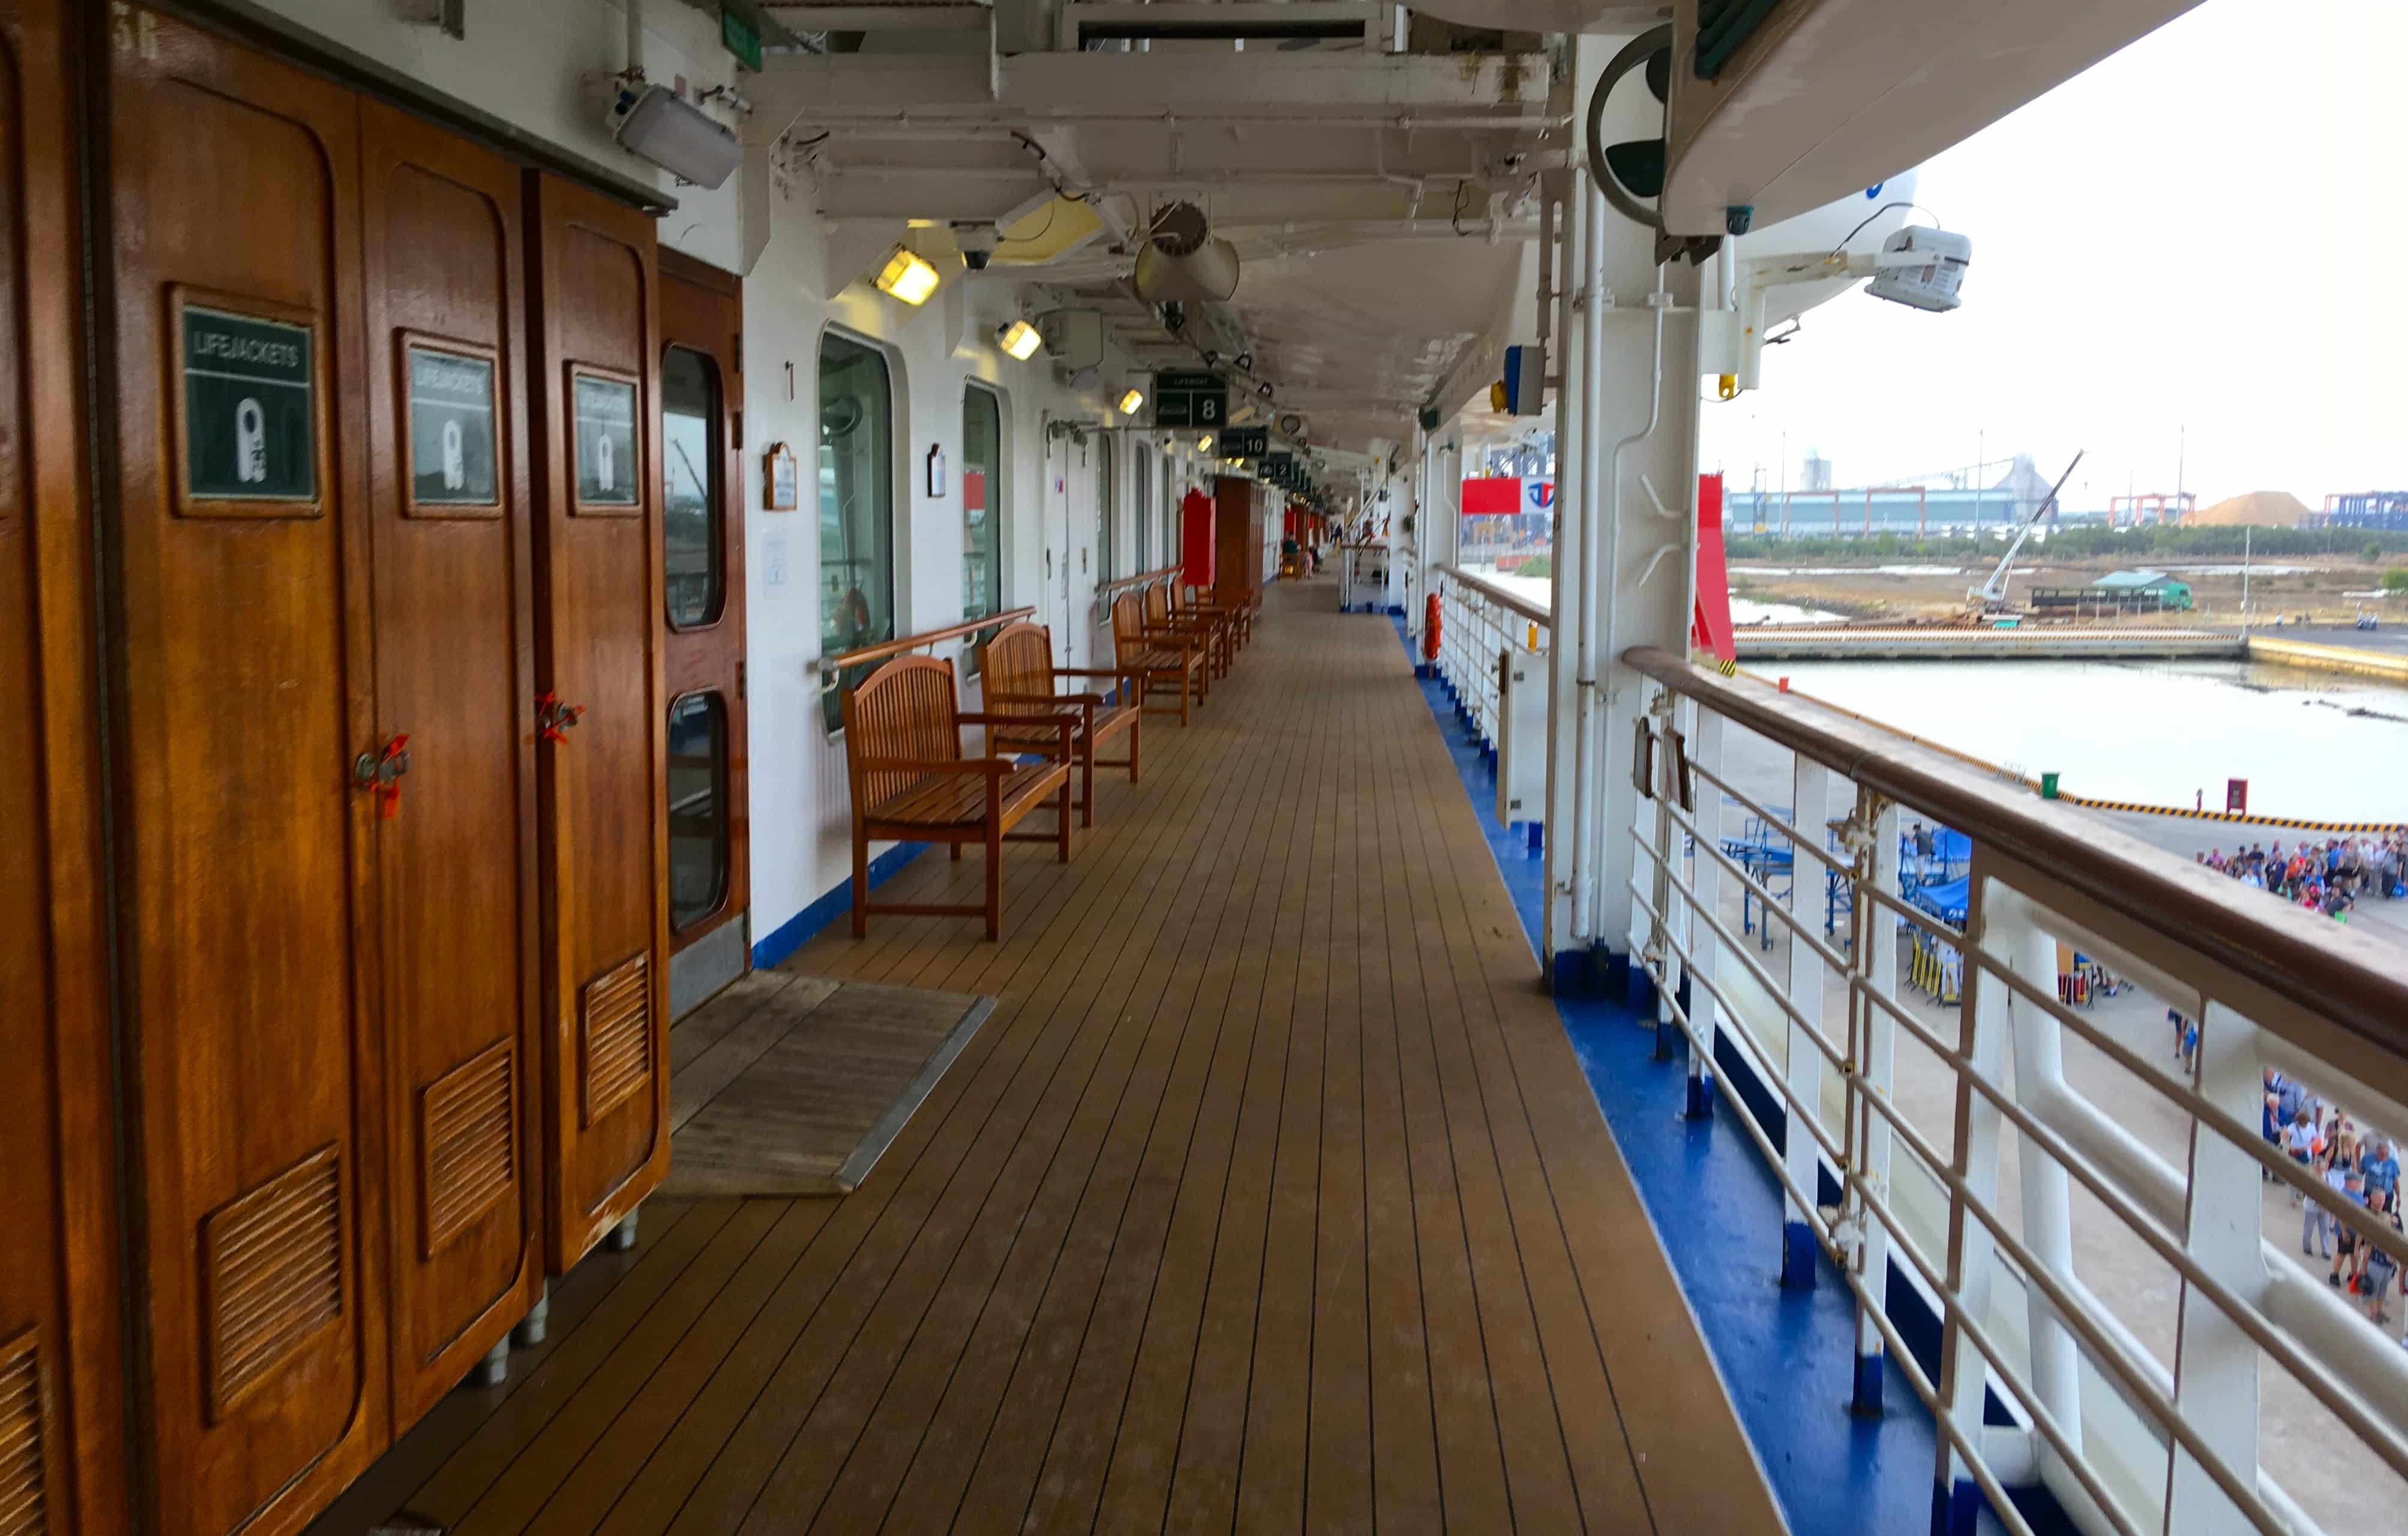 Golden Princess Empty Promenade Deck Cruise Ship Life Jackets Cupboard Railing